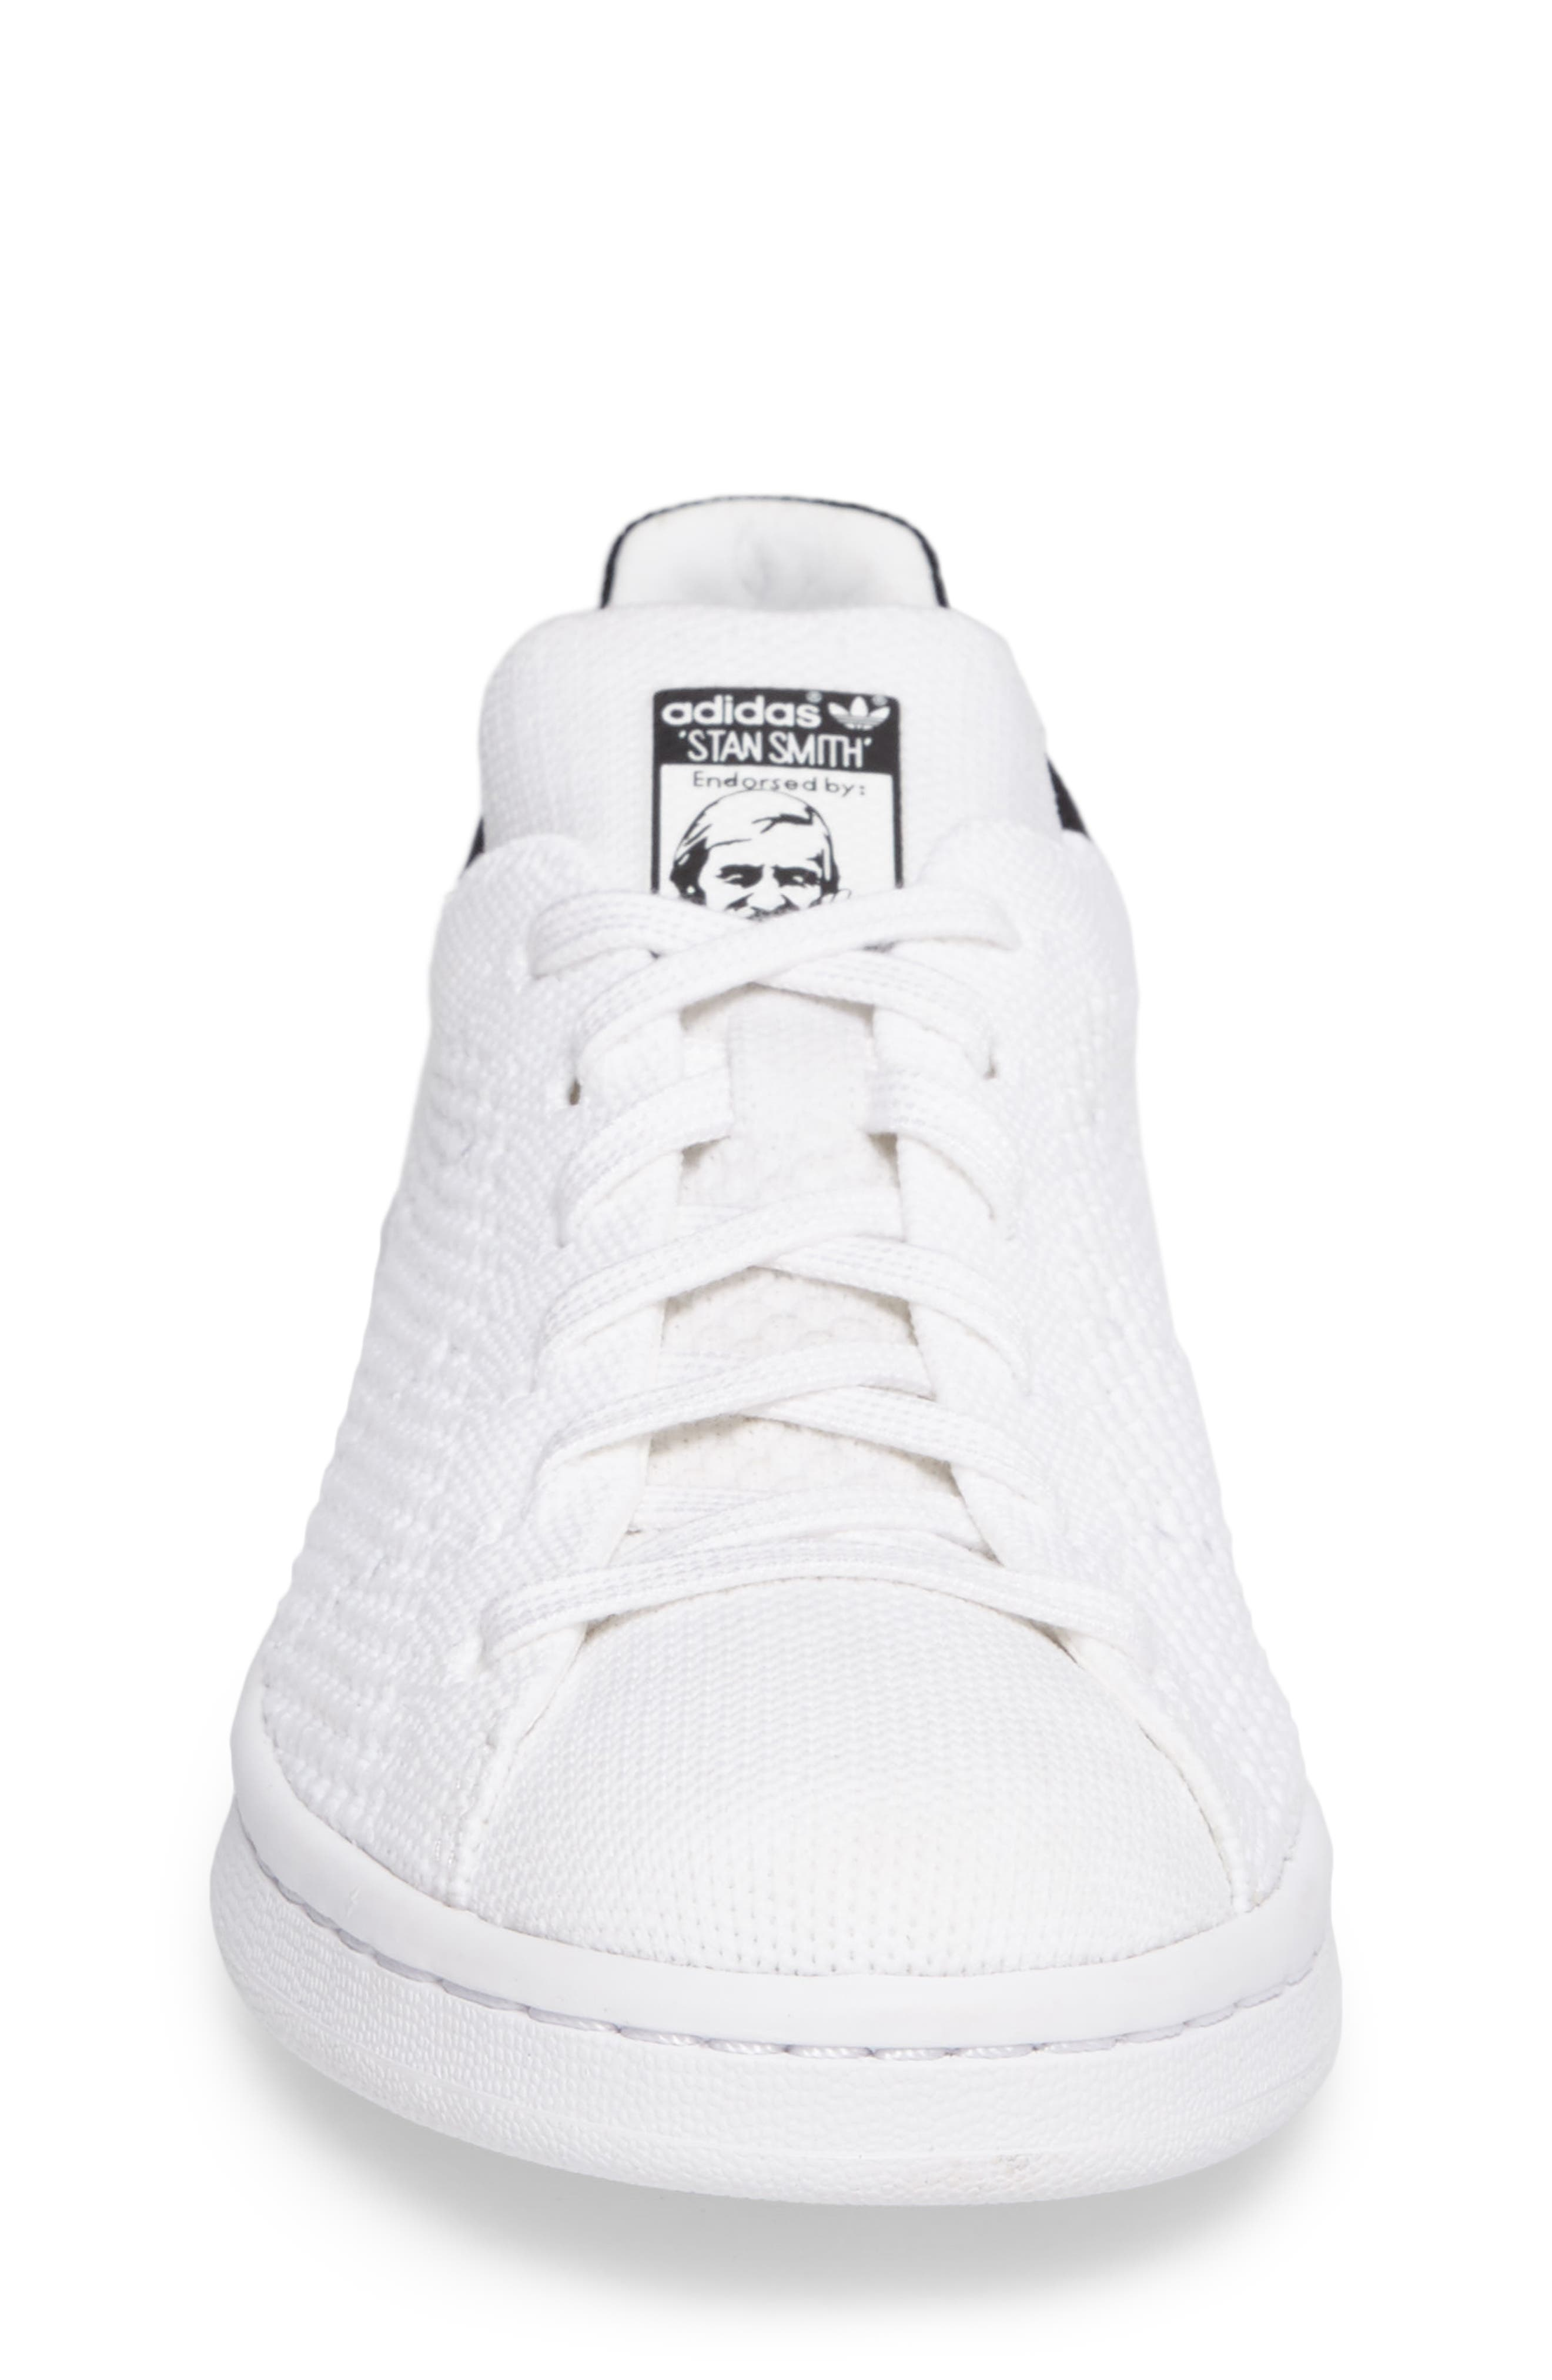 Stan Smith Primeknit Sneaker,                             Alternate thumbnail 4, color,                             100